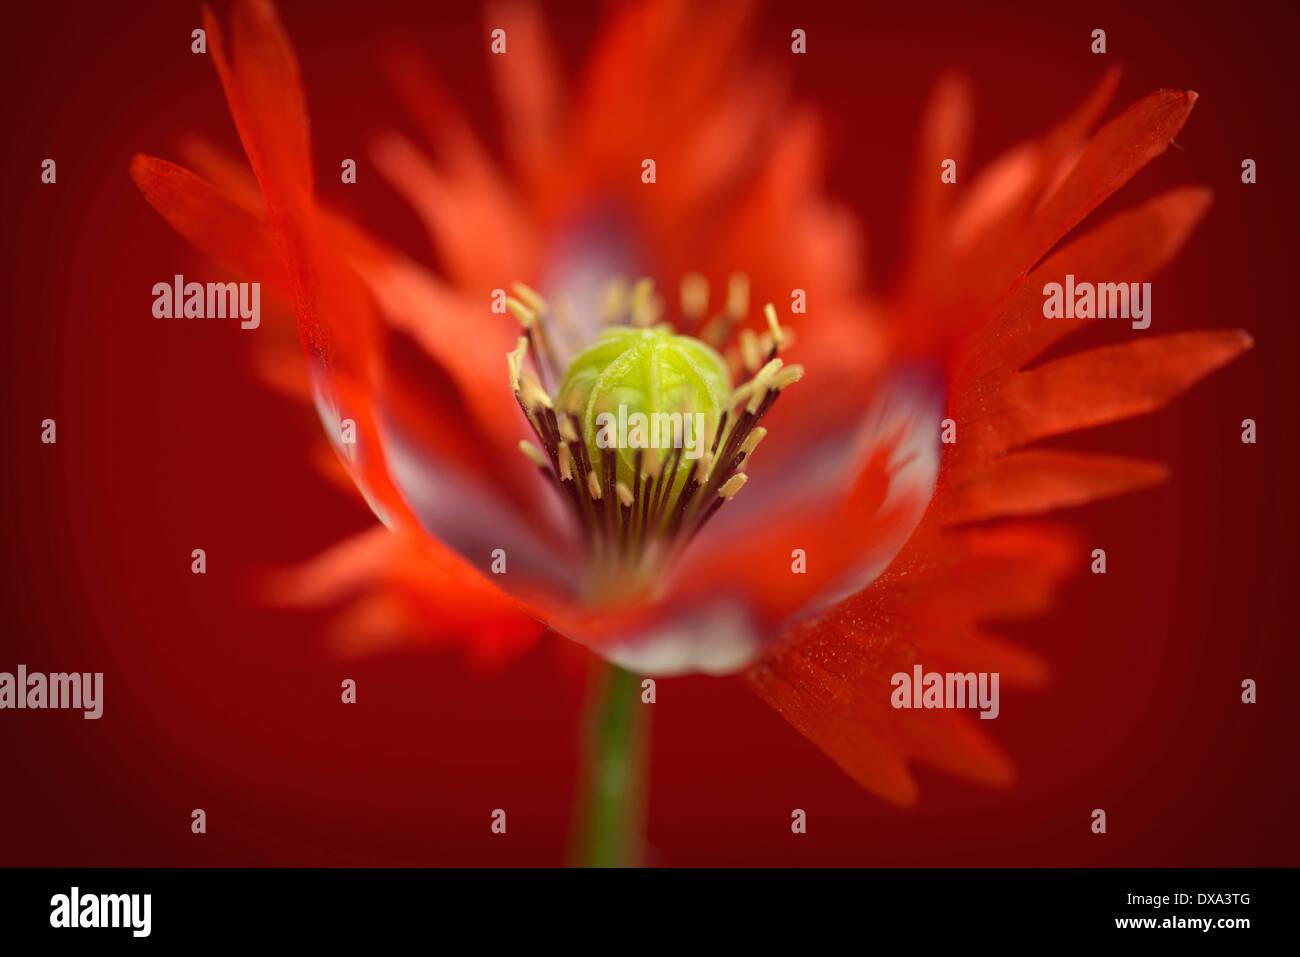 Opium poppy papaver somniferum danish flag red and white opium poppy papaver somniferum danish flag red and white coloured flower showing fringed petals and stamens mightylinksfo